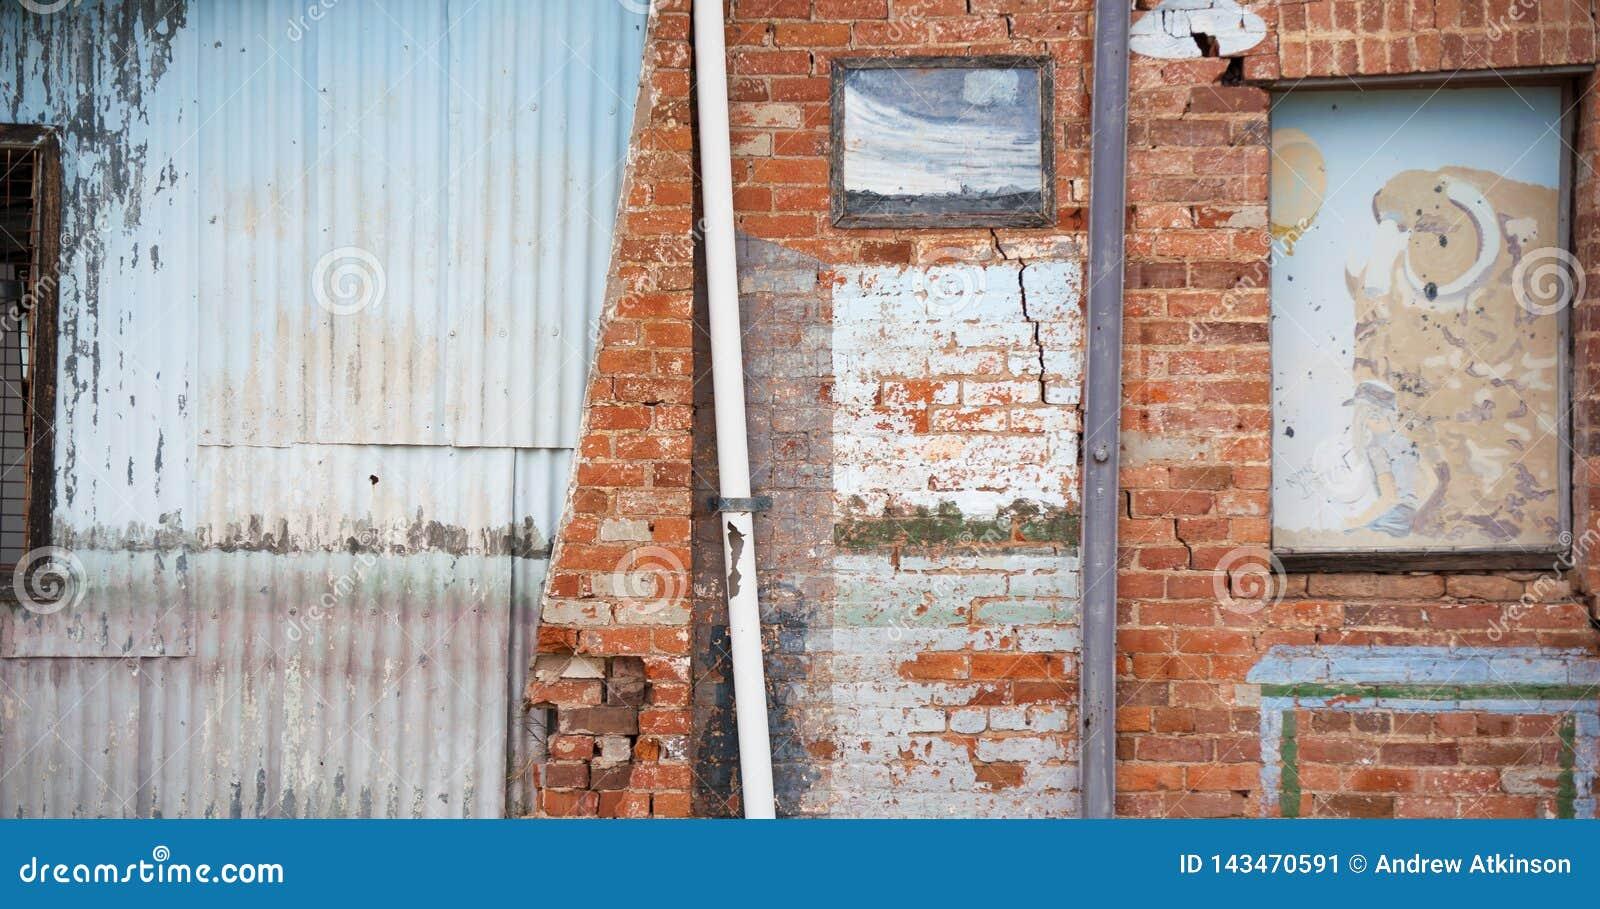 Old run down wall made of bricks and corrugated iron